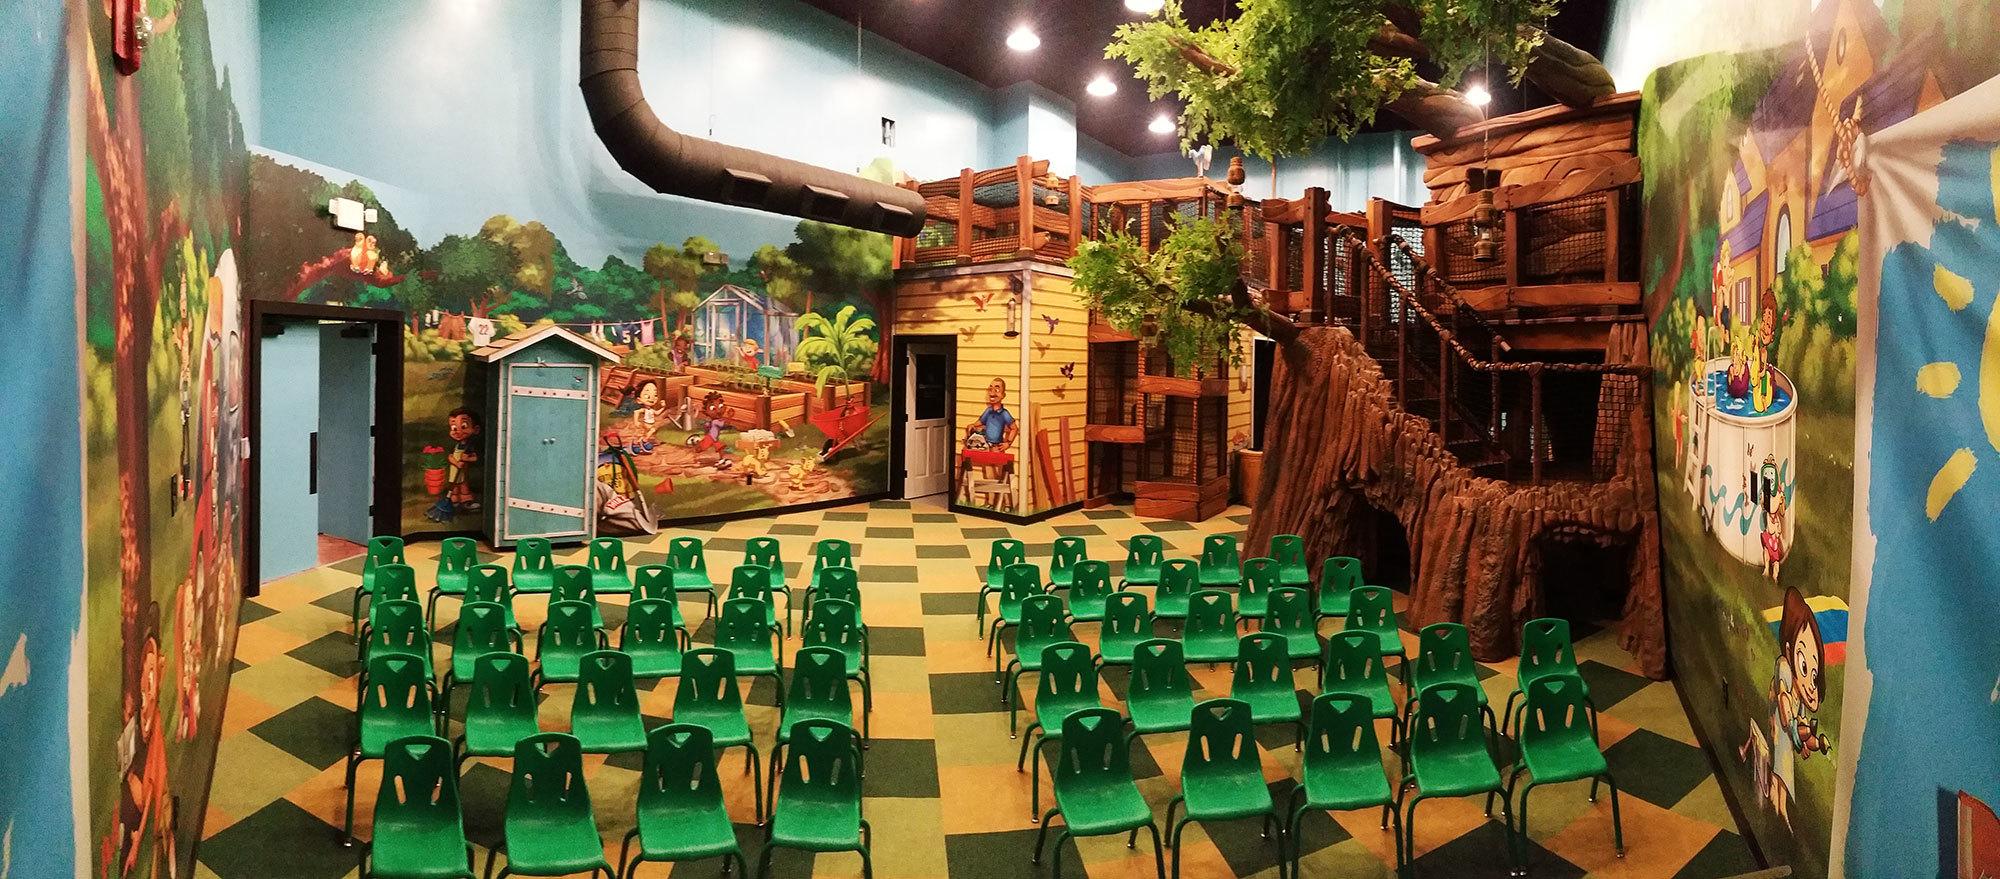 Backyard Neighborhood Treehouse Themed Environment at Choose Life Church